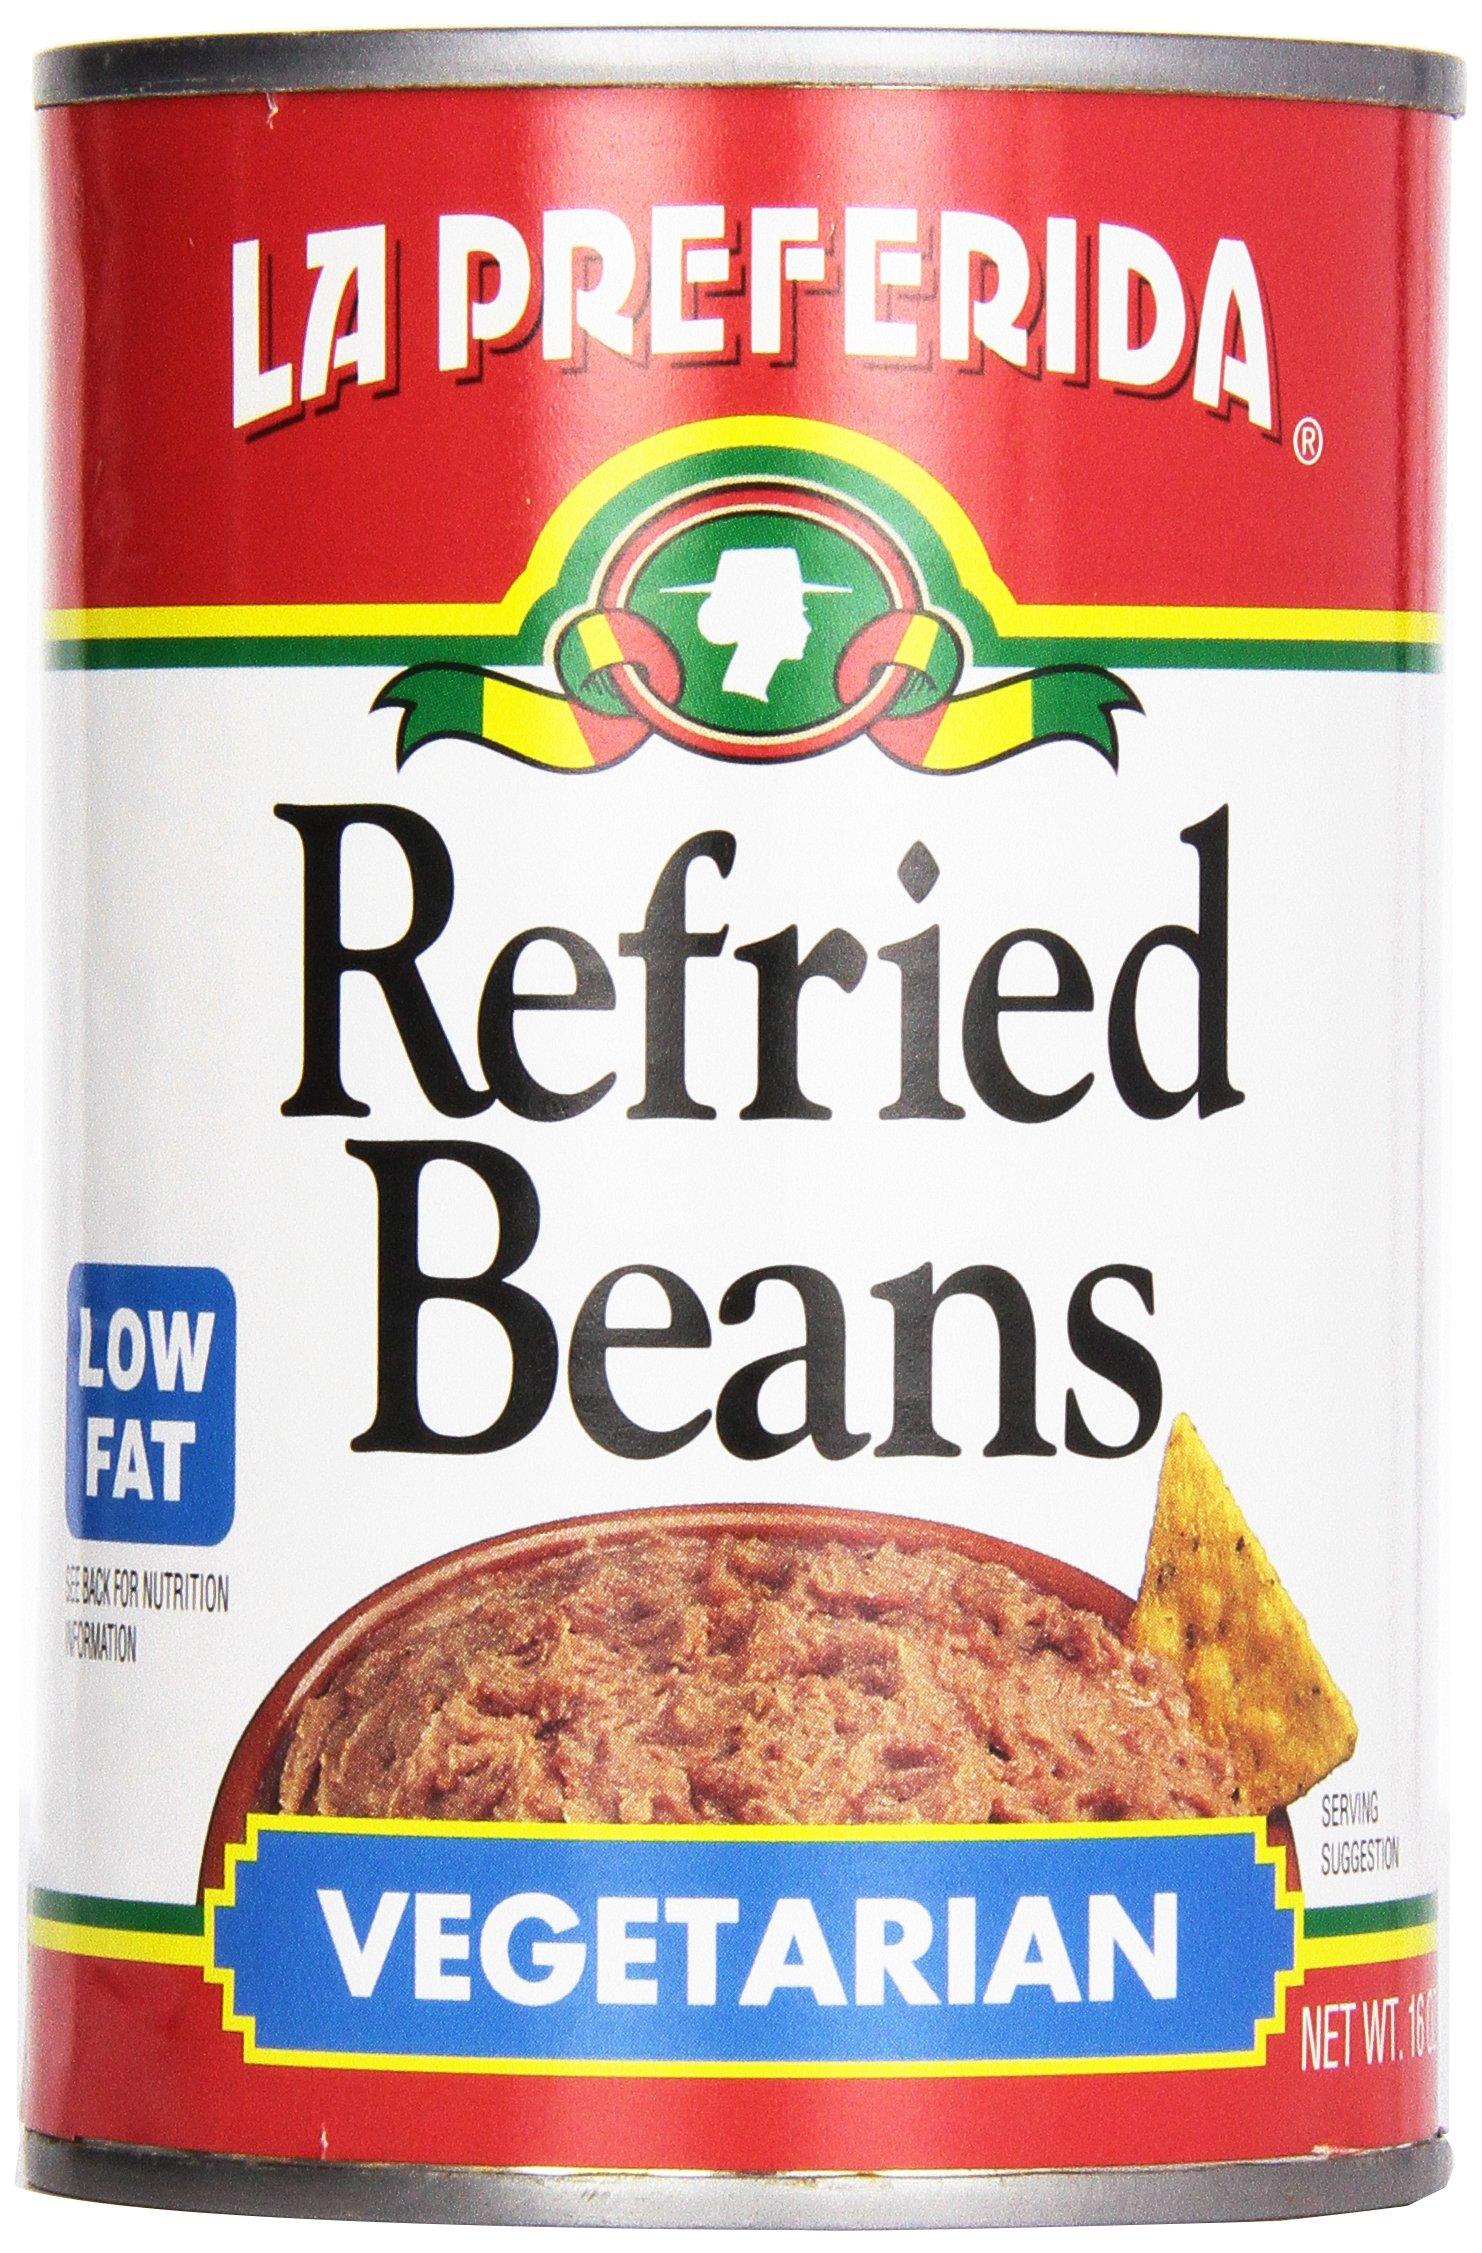 La Preferida Refried Beans, Vegetarian and Low Fat, 16 oz